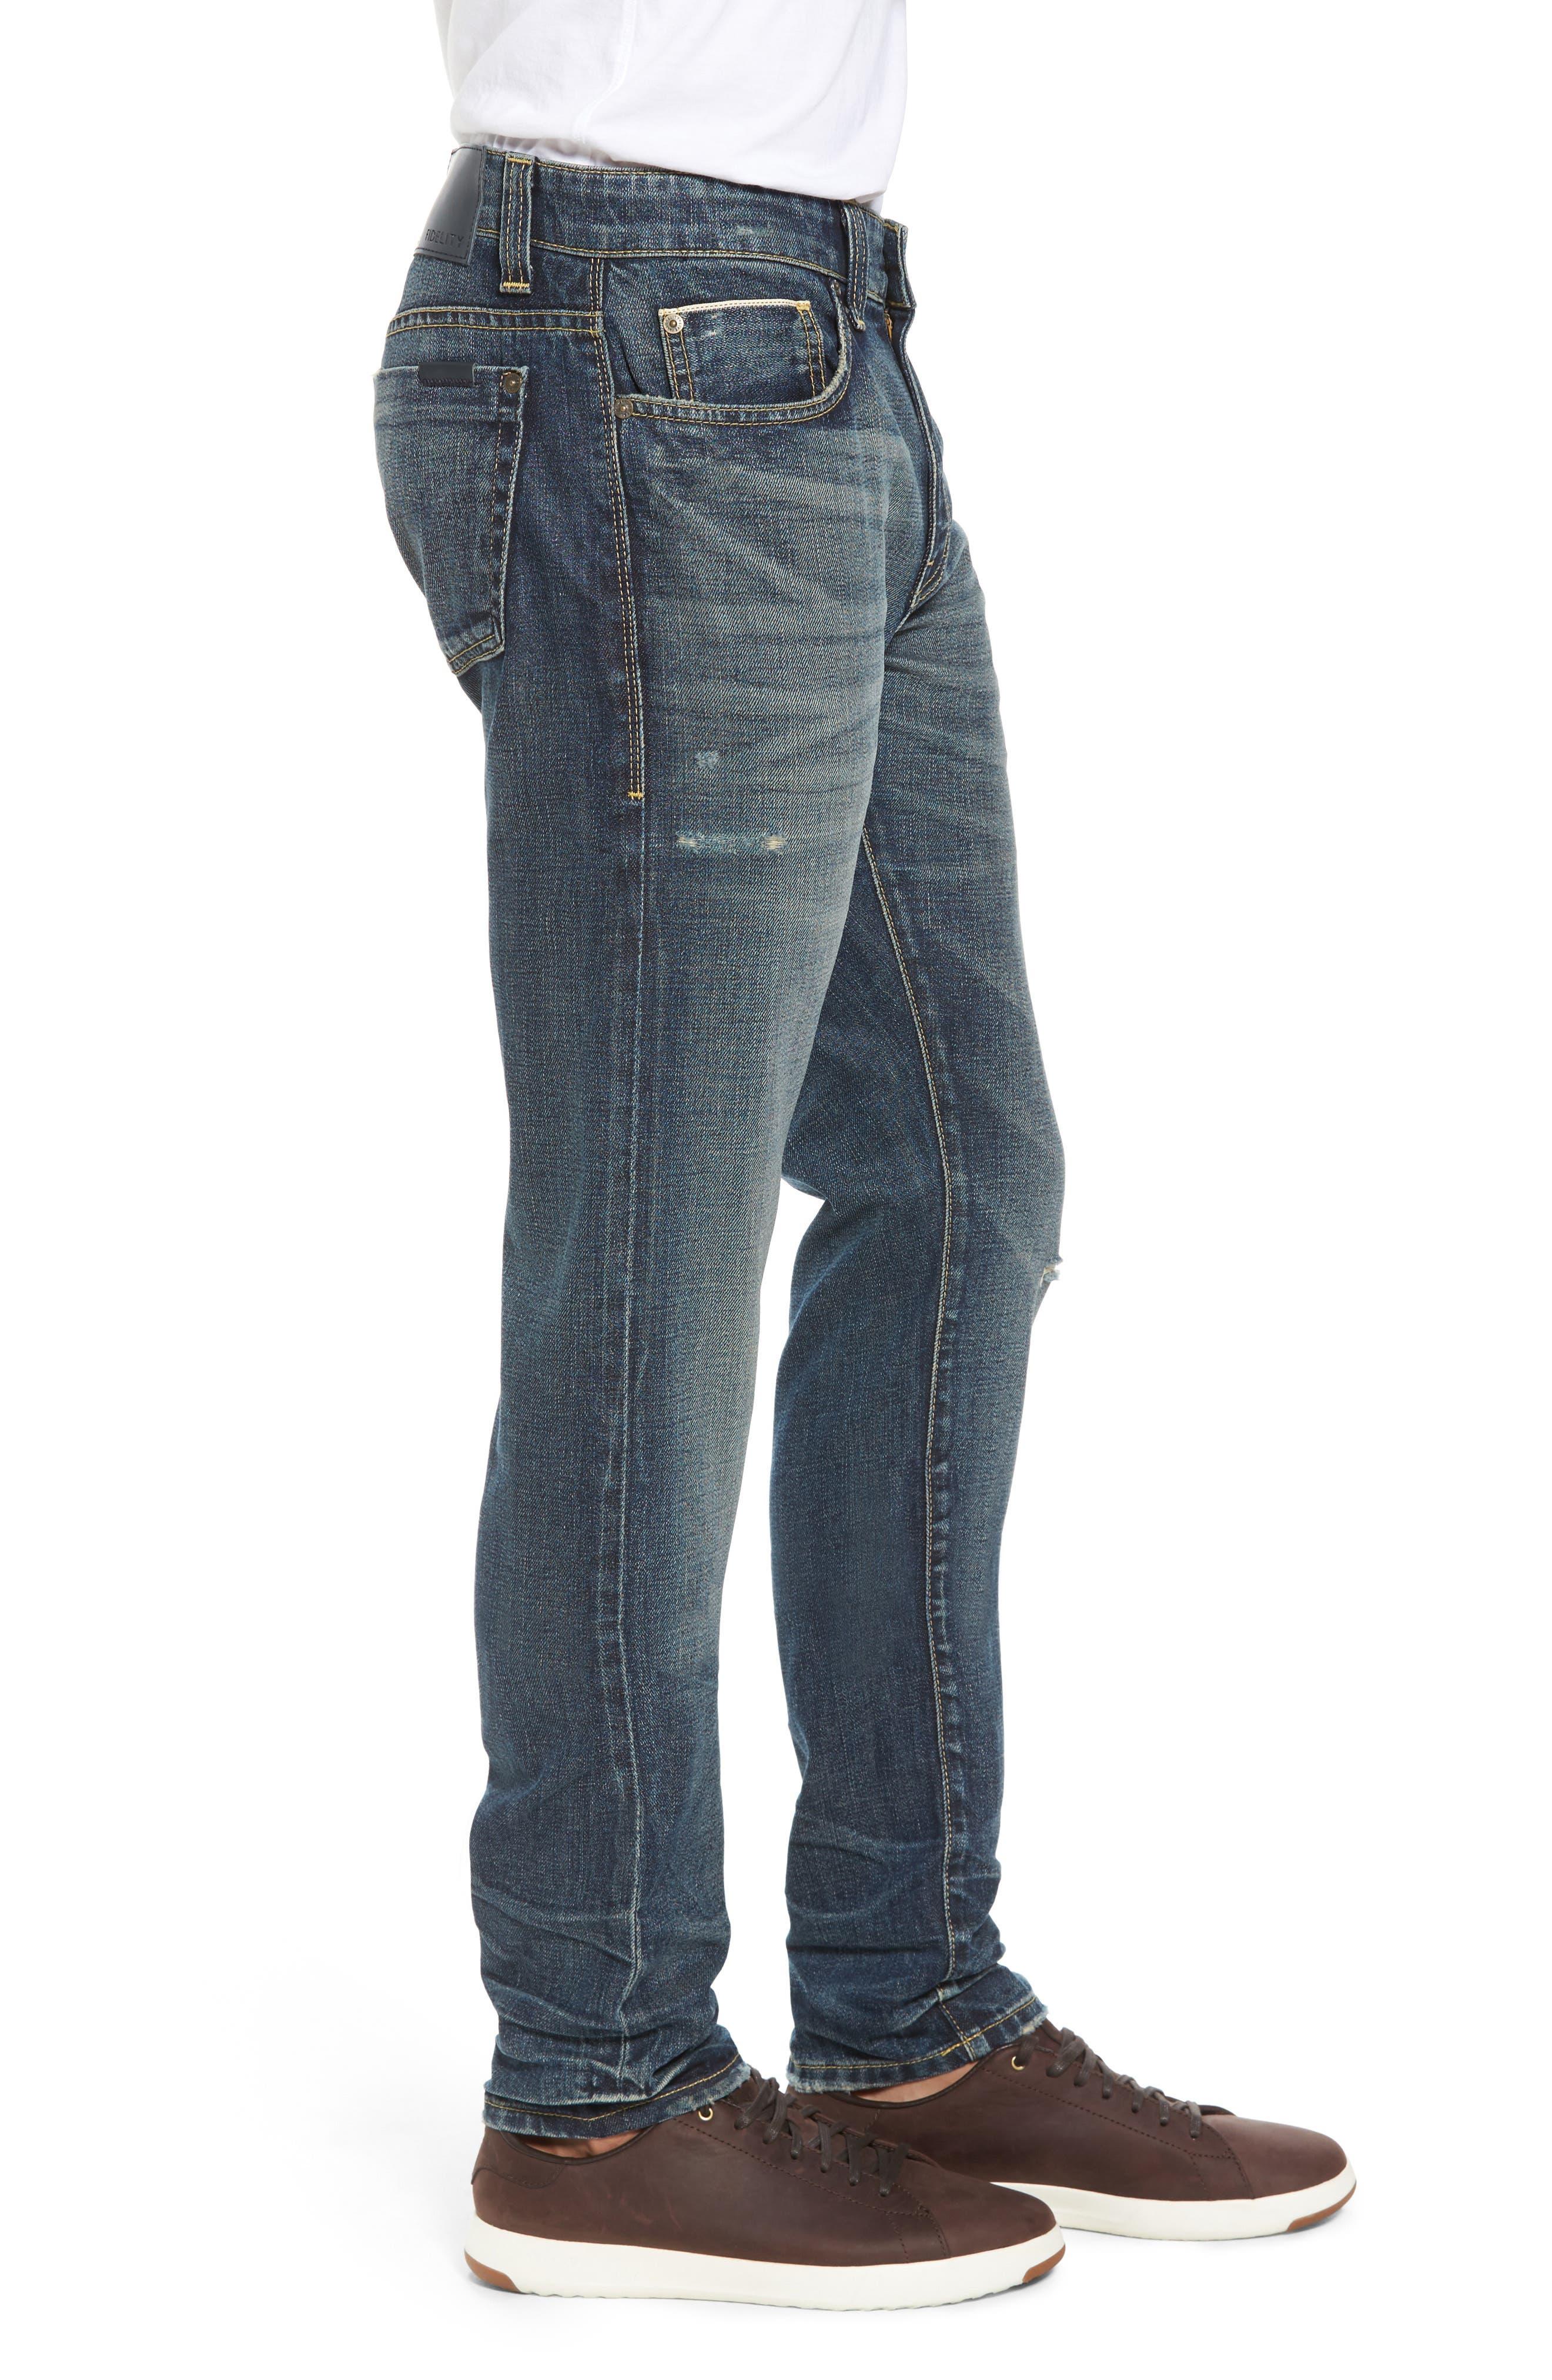 Fideltiy Denim Torino Slim Fit Jeans,                             Alternate thumbnail 3, color,                             Crystal Blue